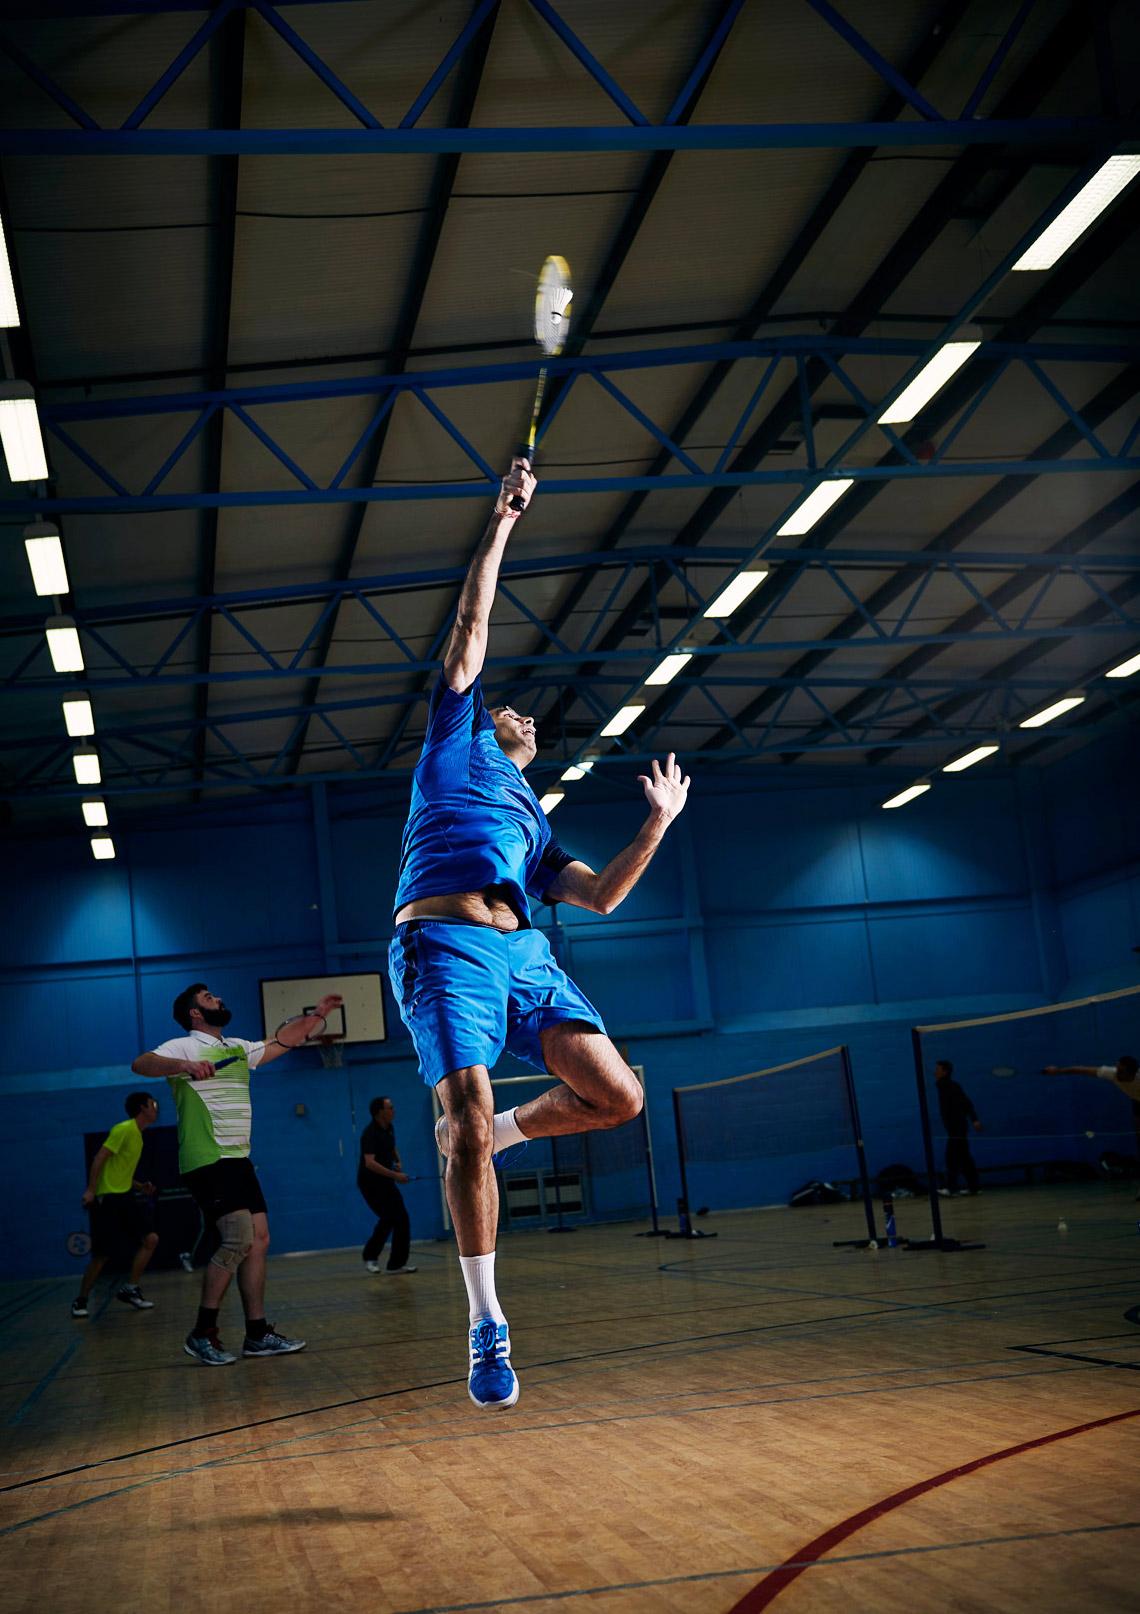 Badminton mid-air smash